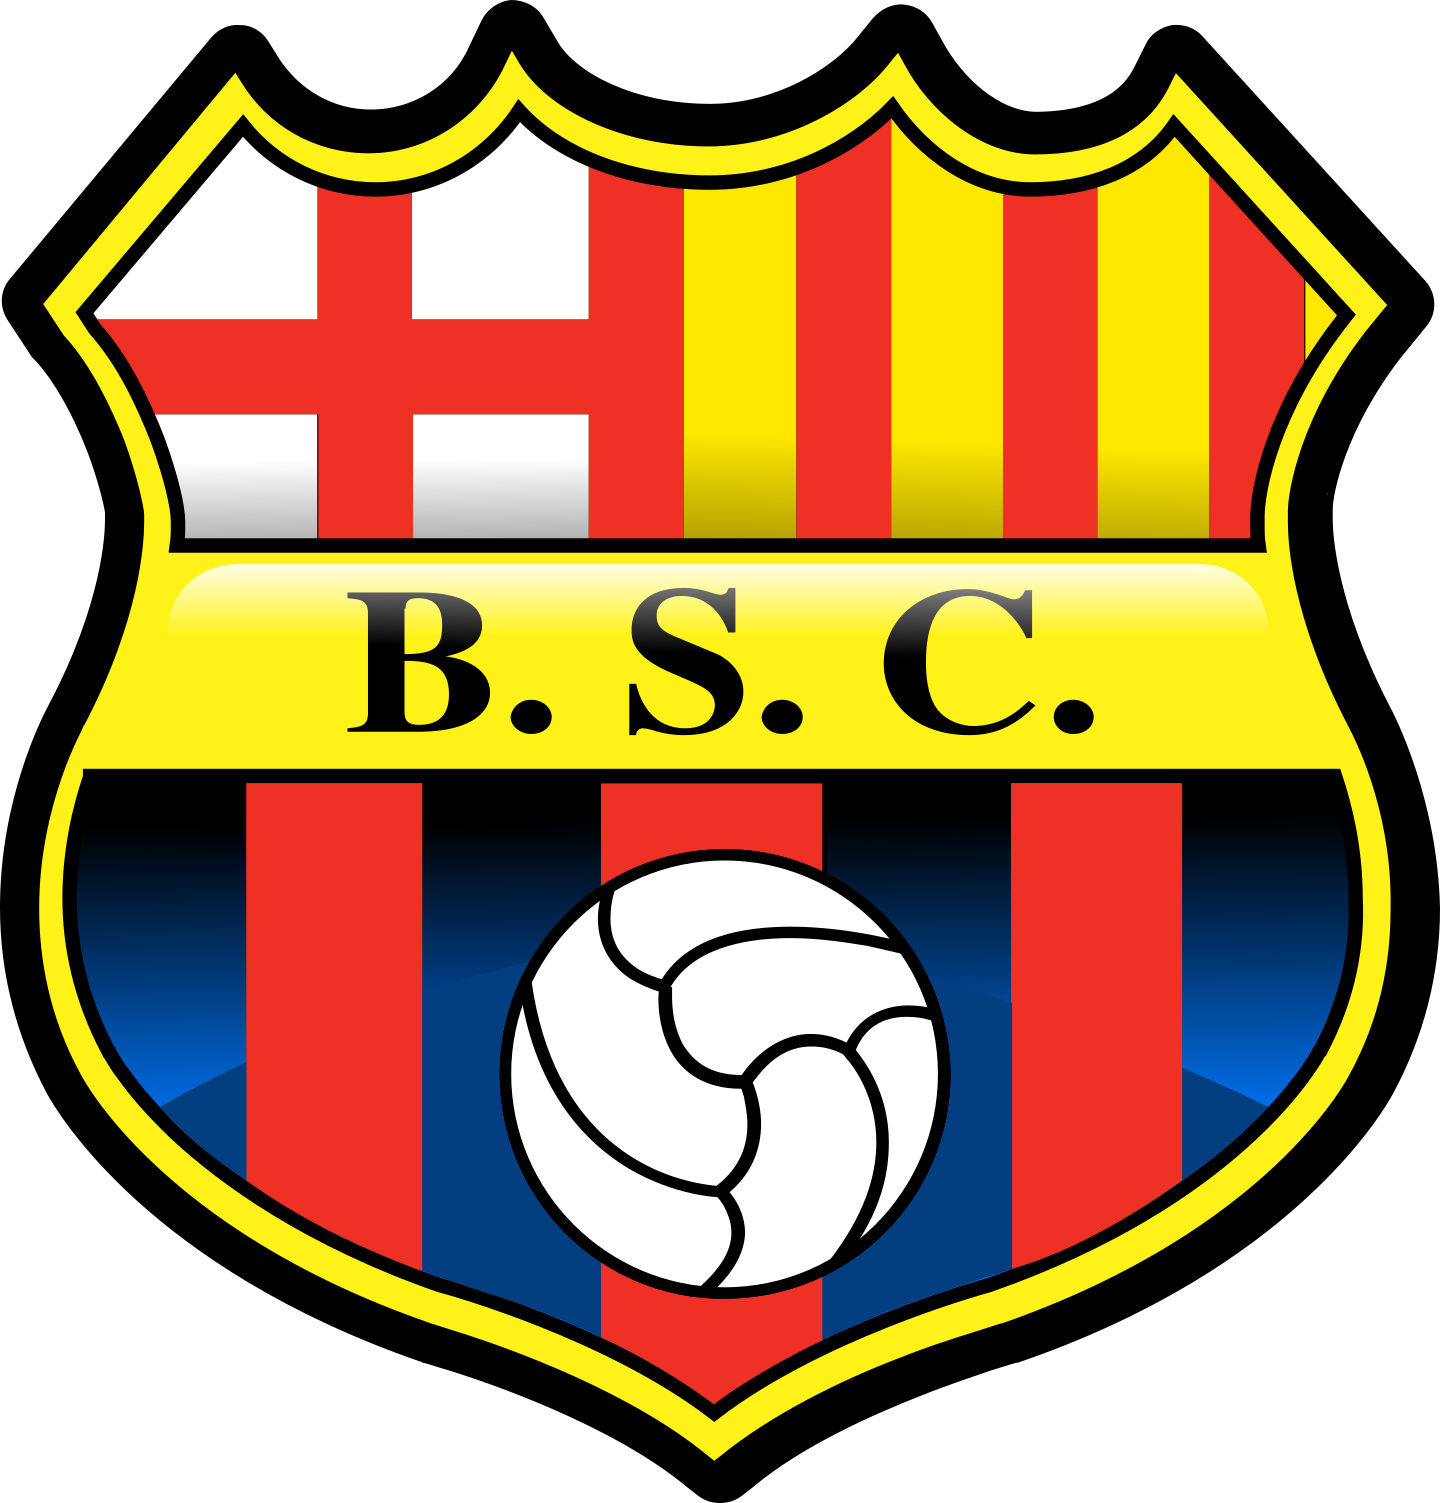 barcelona guayaquil logo 2 - Barcelona SC Guayaquil Logo